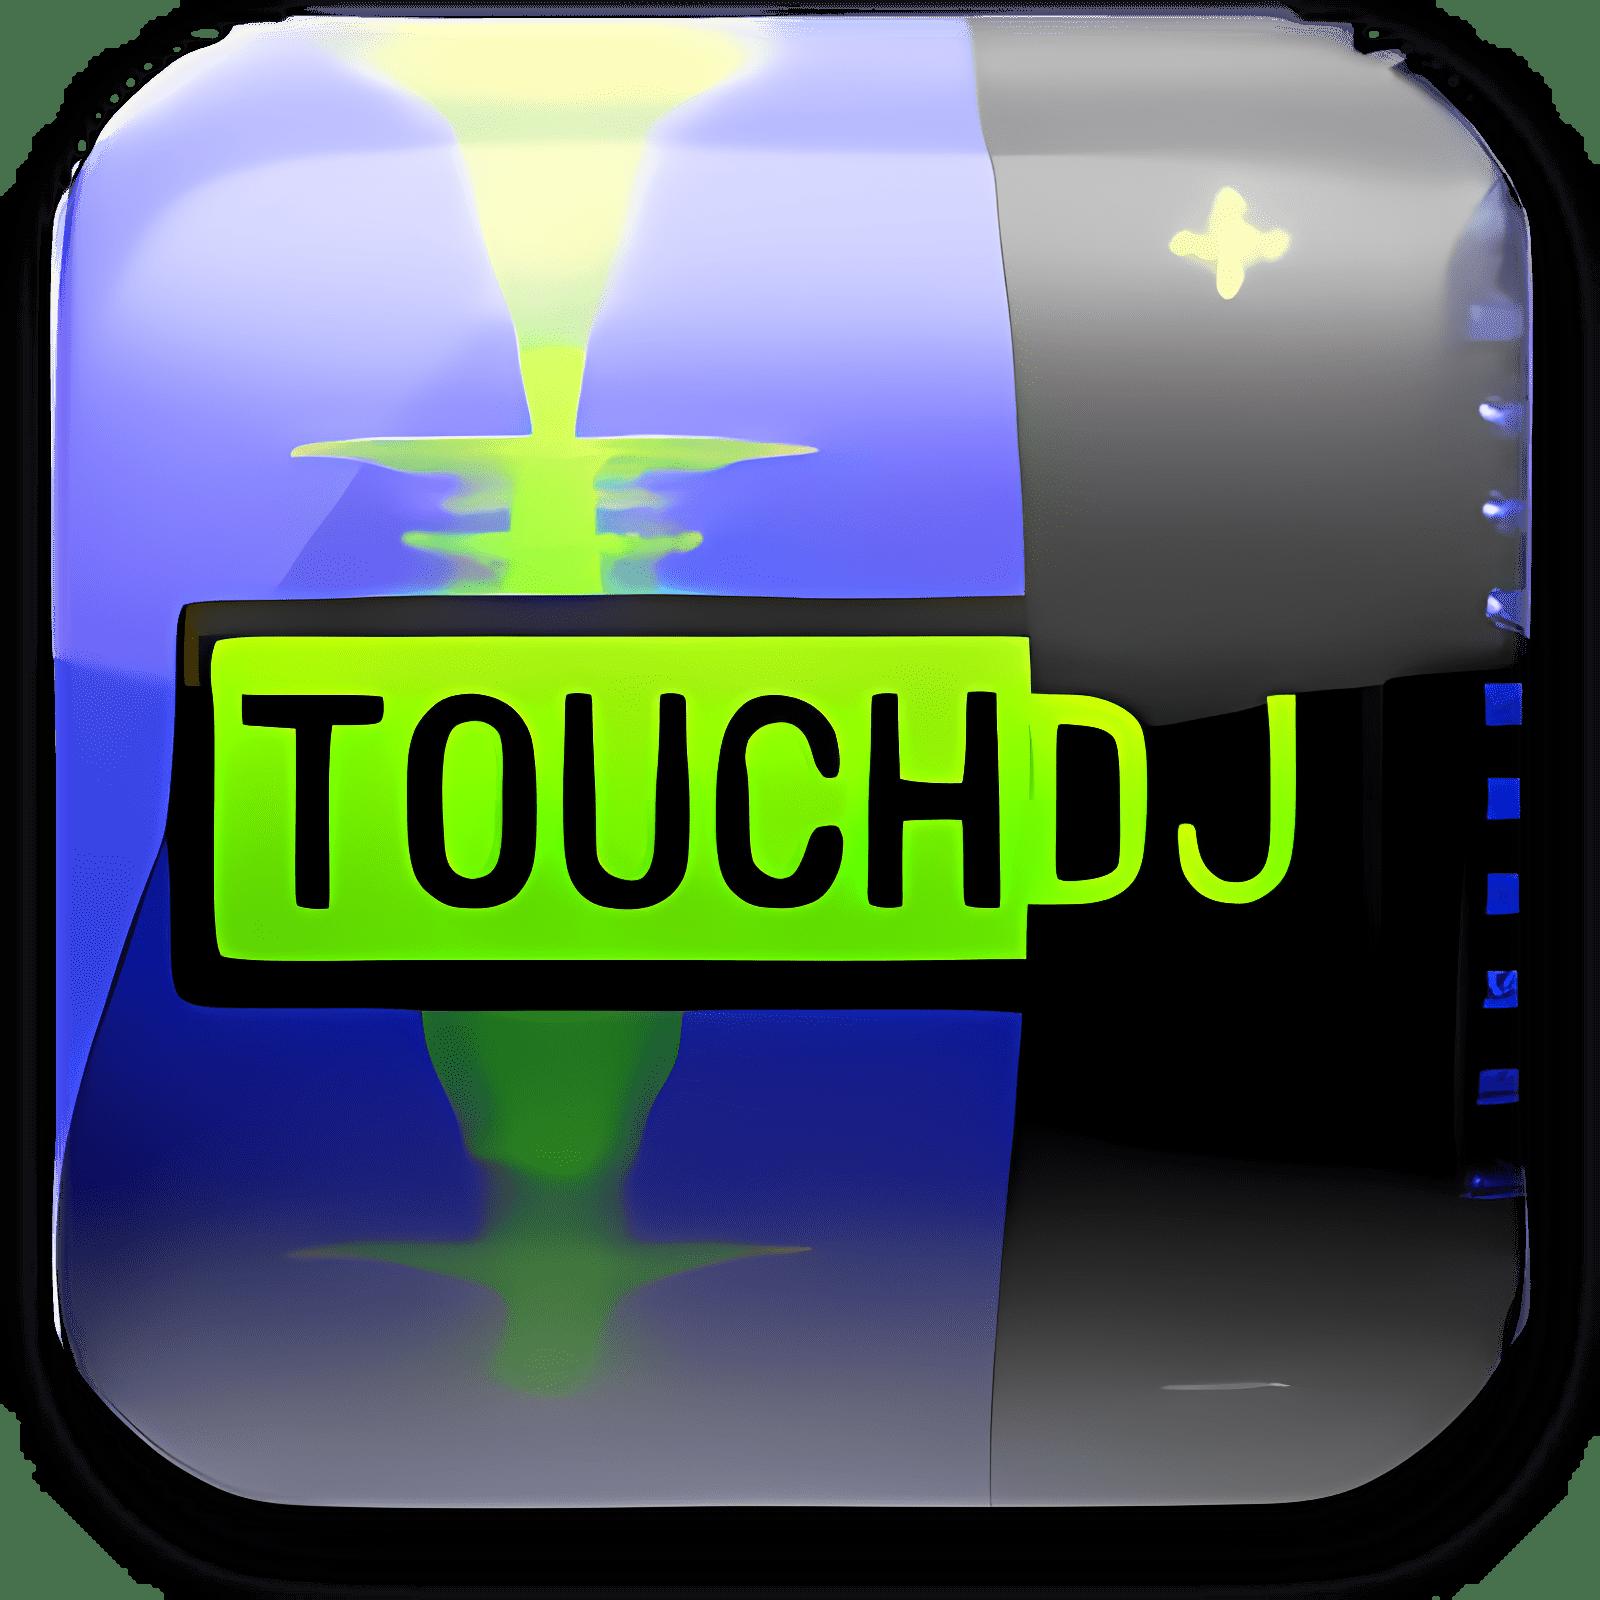 Touch DJ